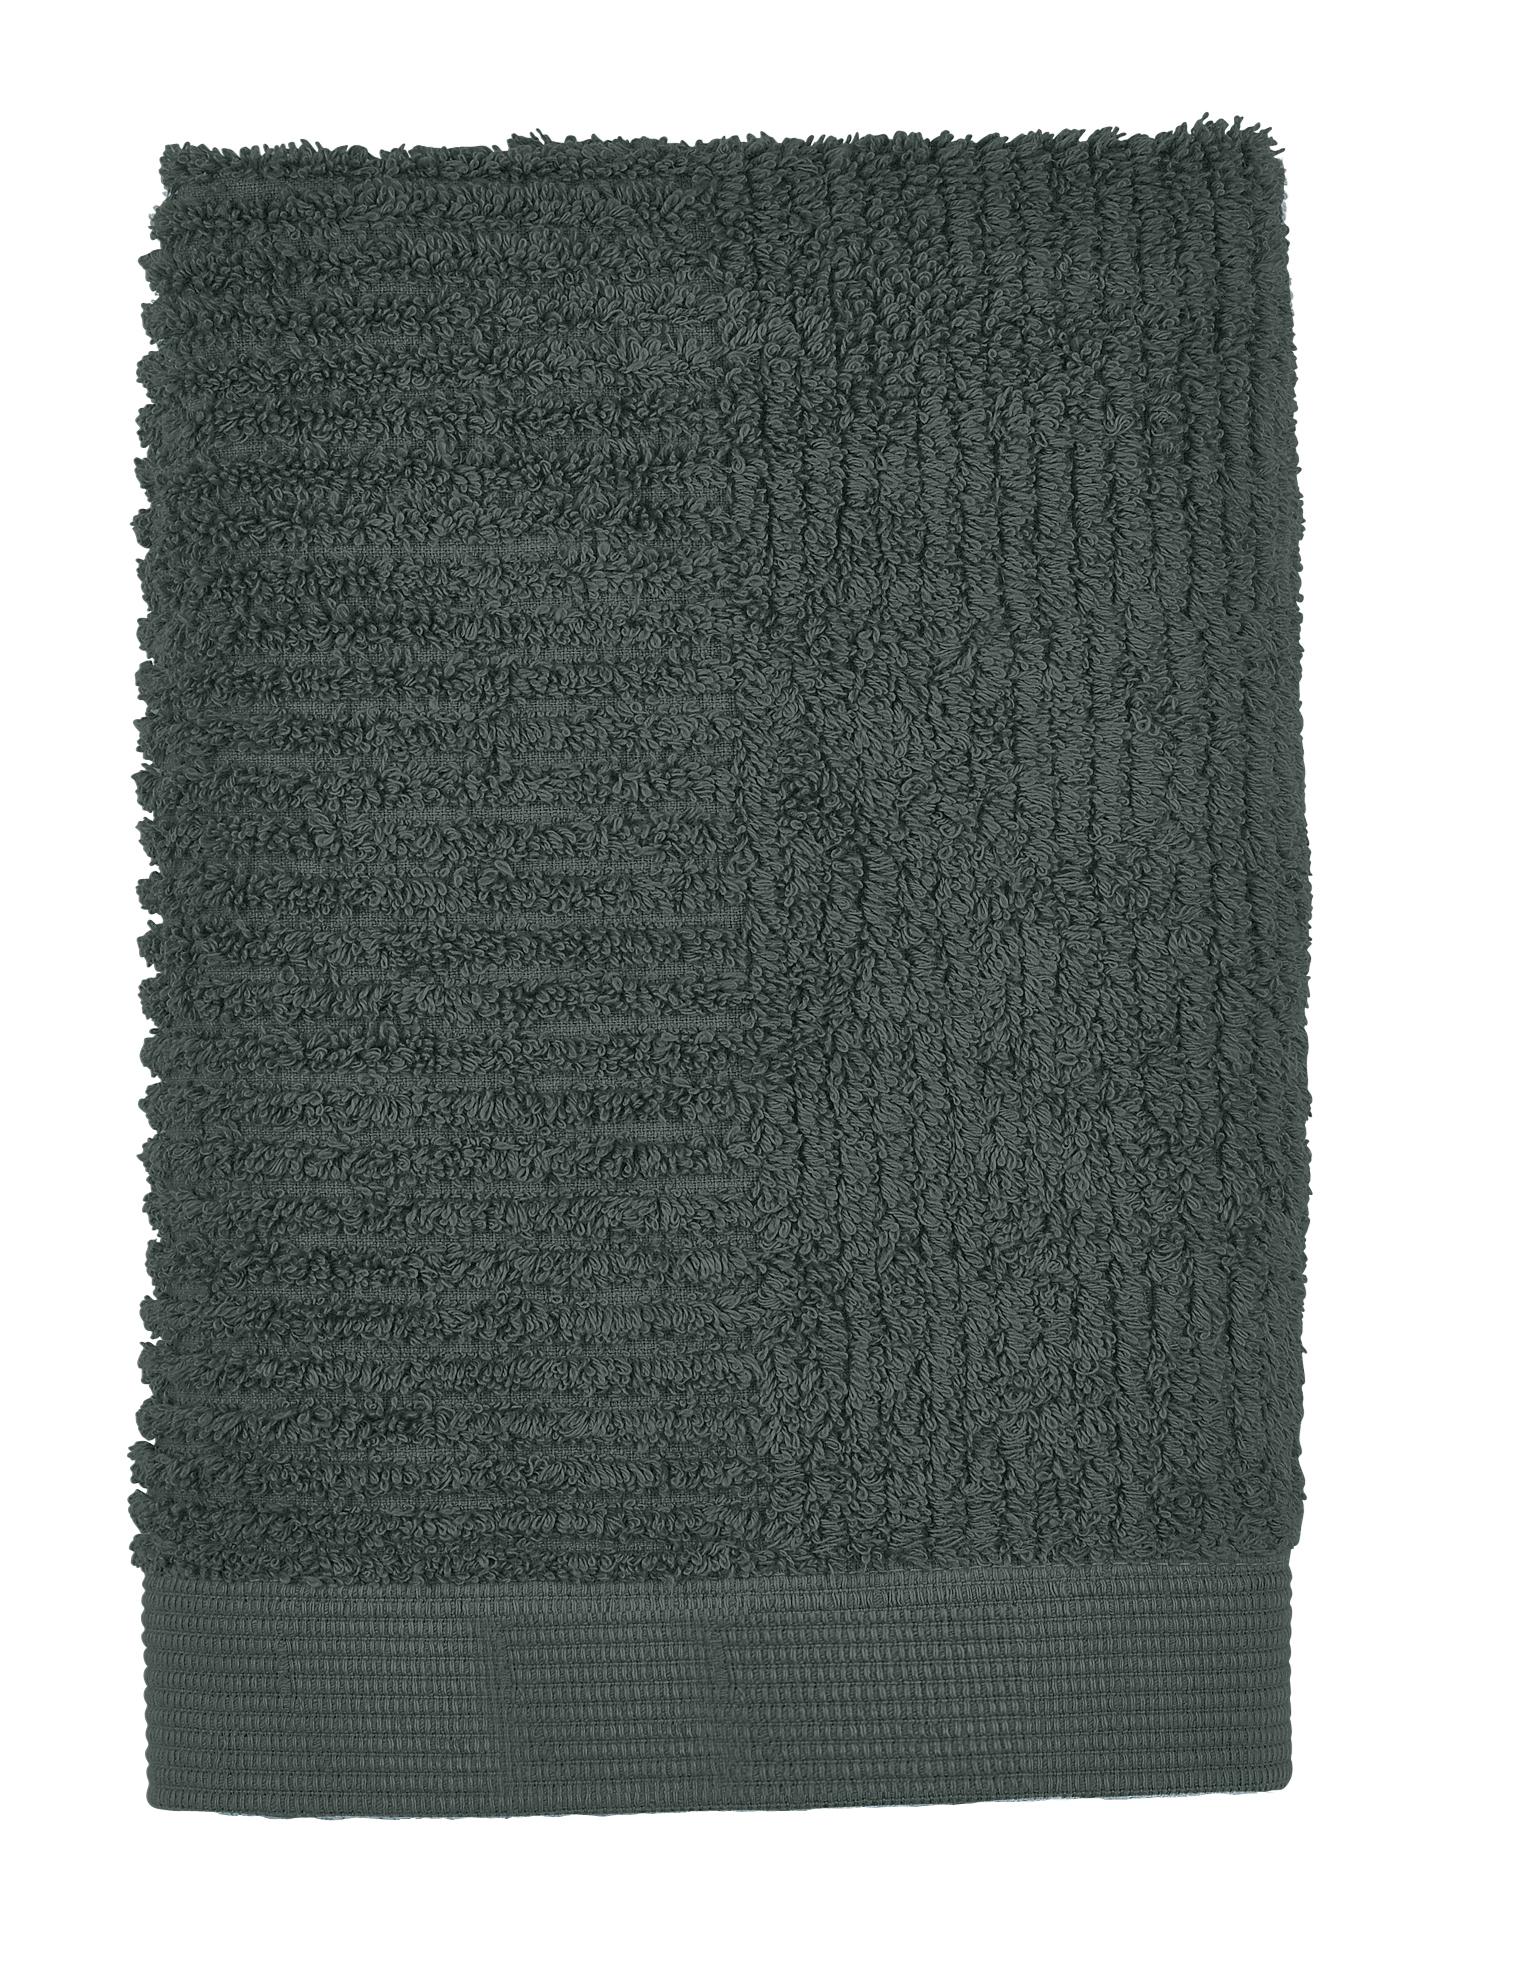 Zone - Classic Towel 50 x 70 cm - Pine Green (330336)